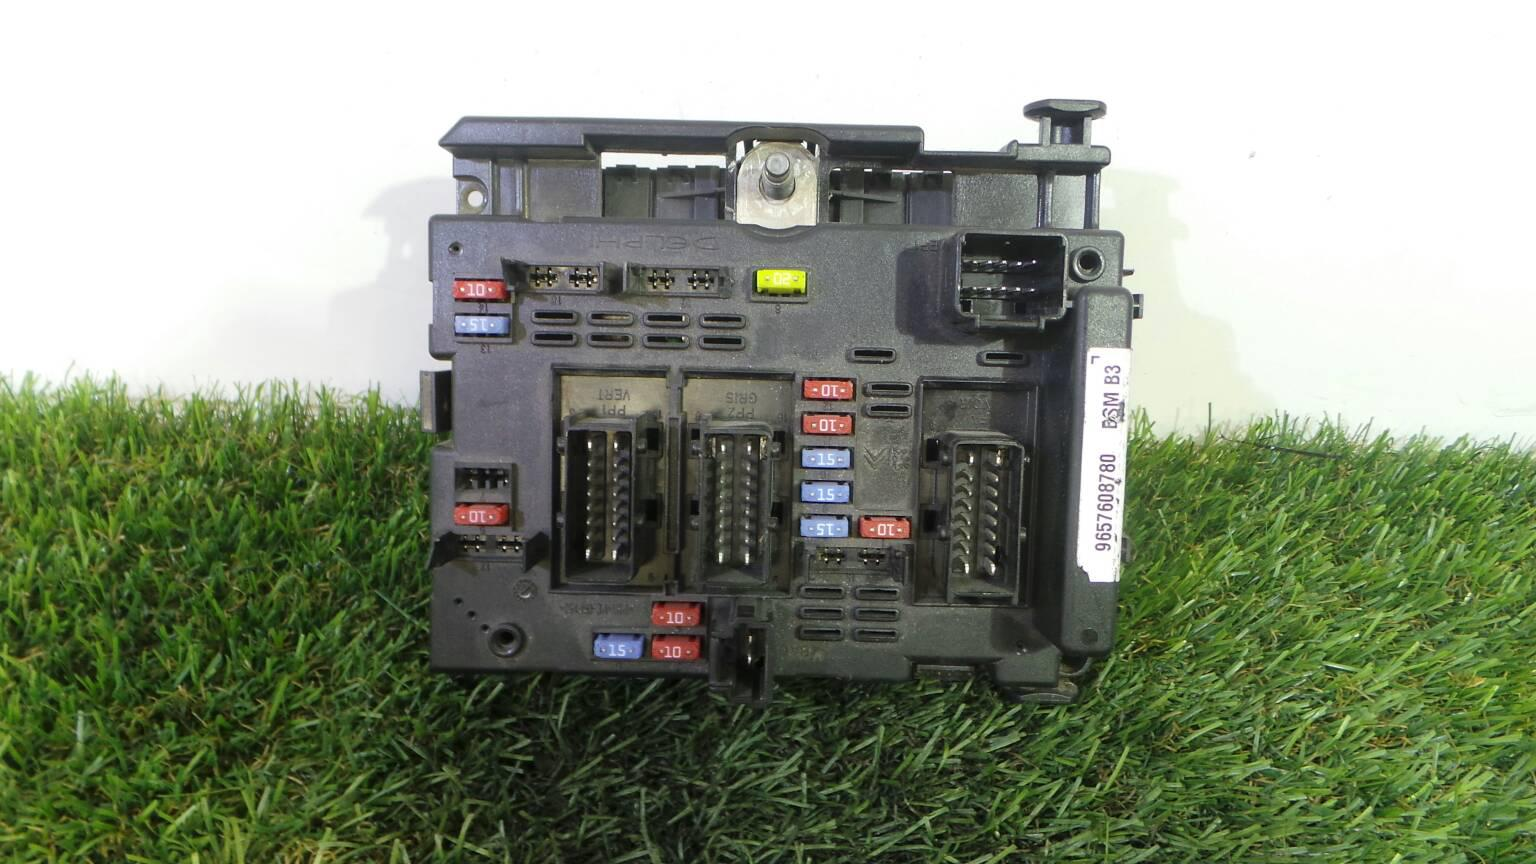 Fuse Box 96 576 087 80 CITROËN, XSARA PICASSO (N68) 1.6 HDi(